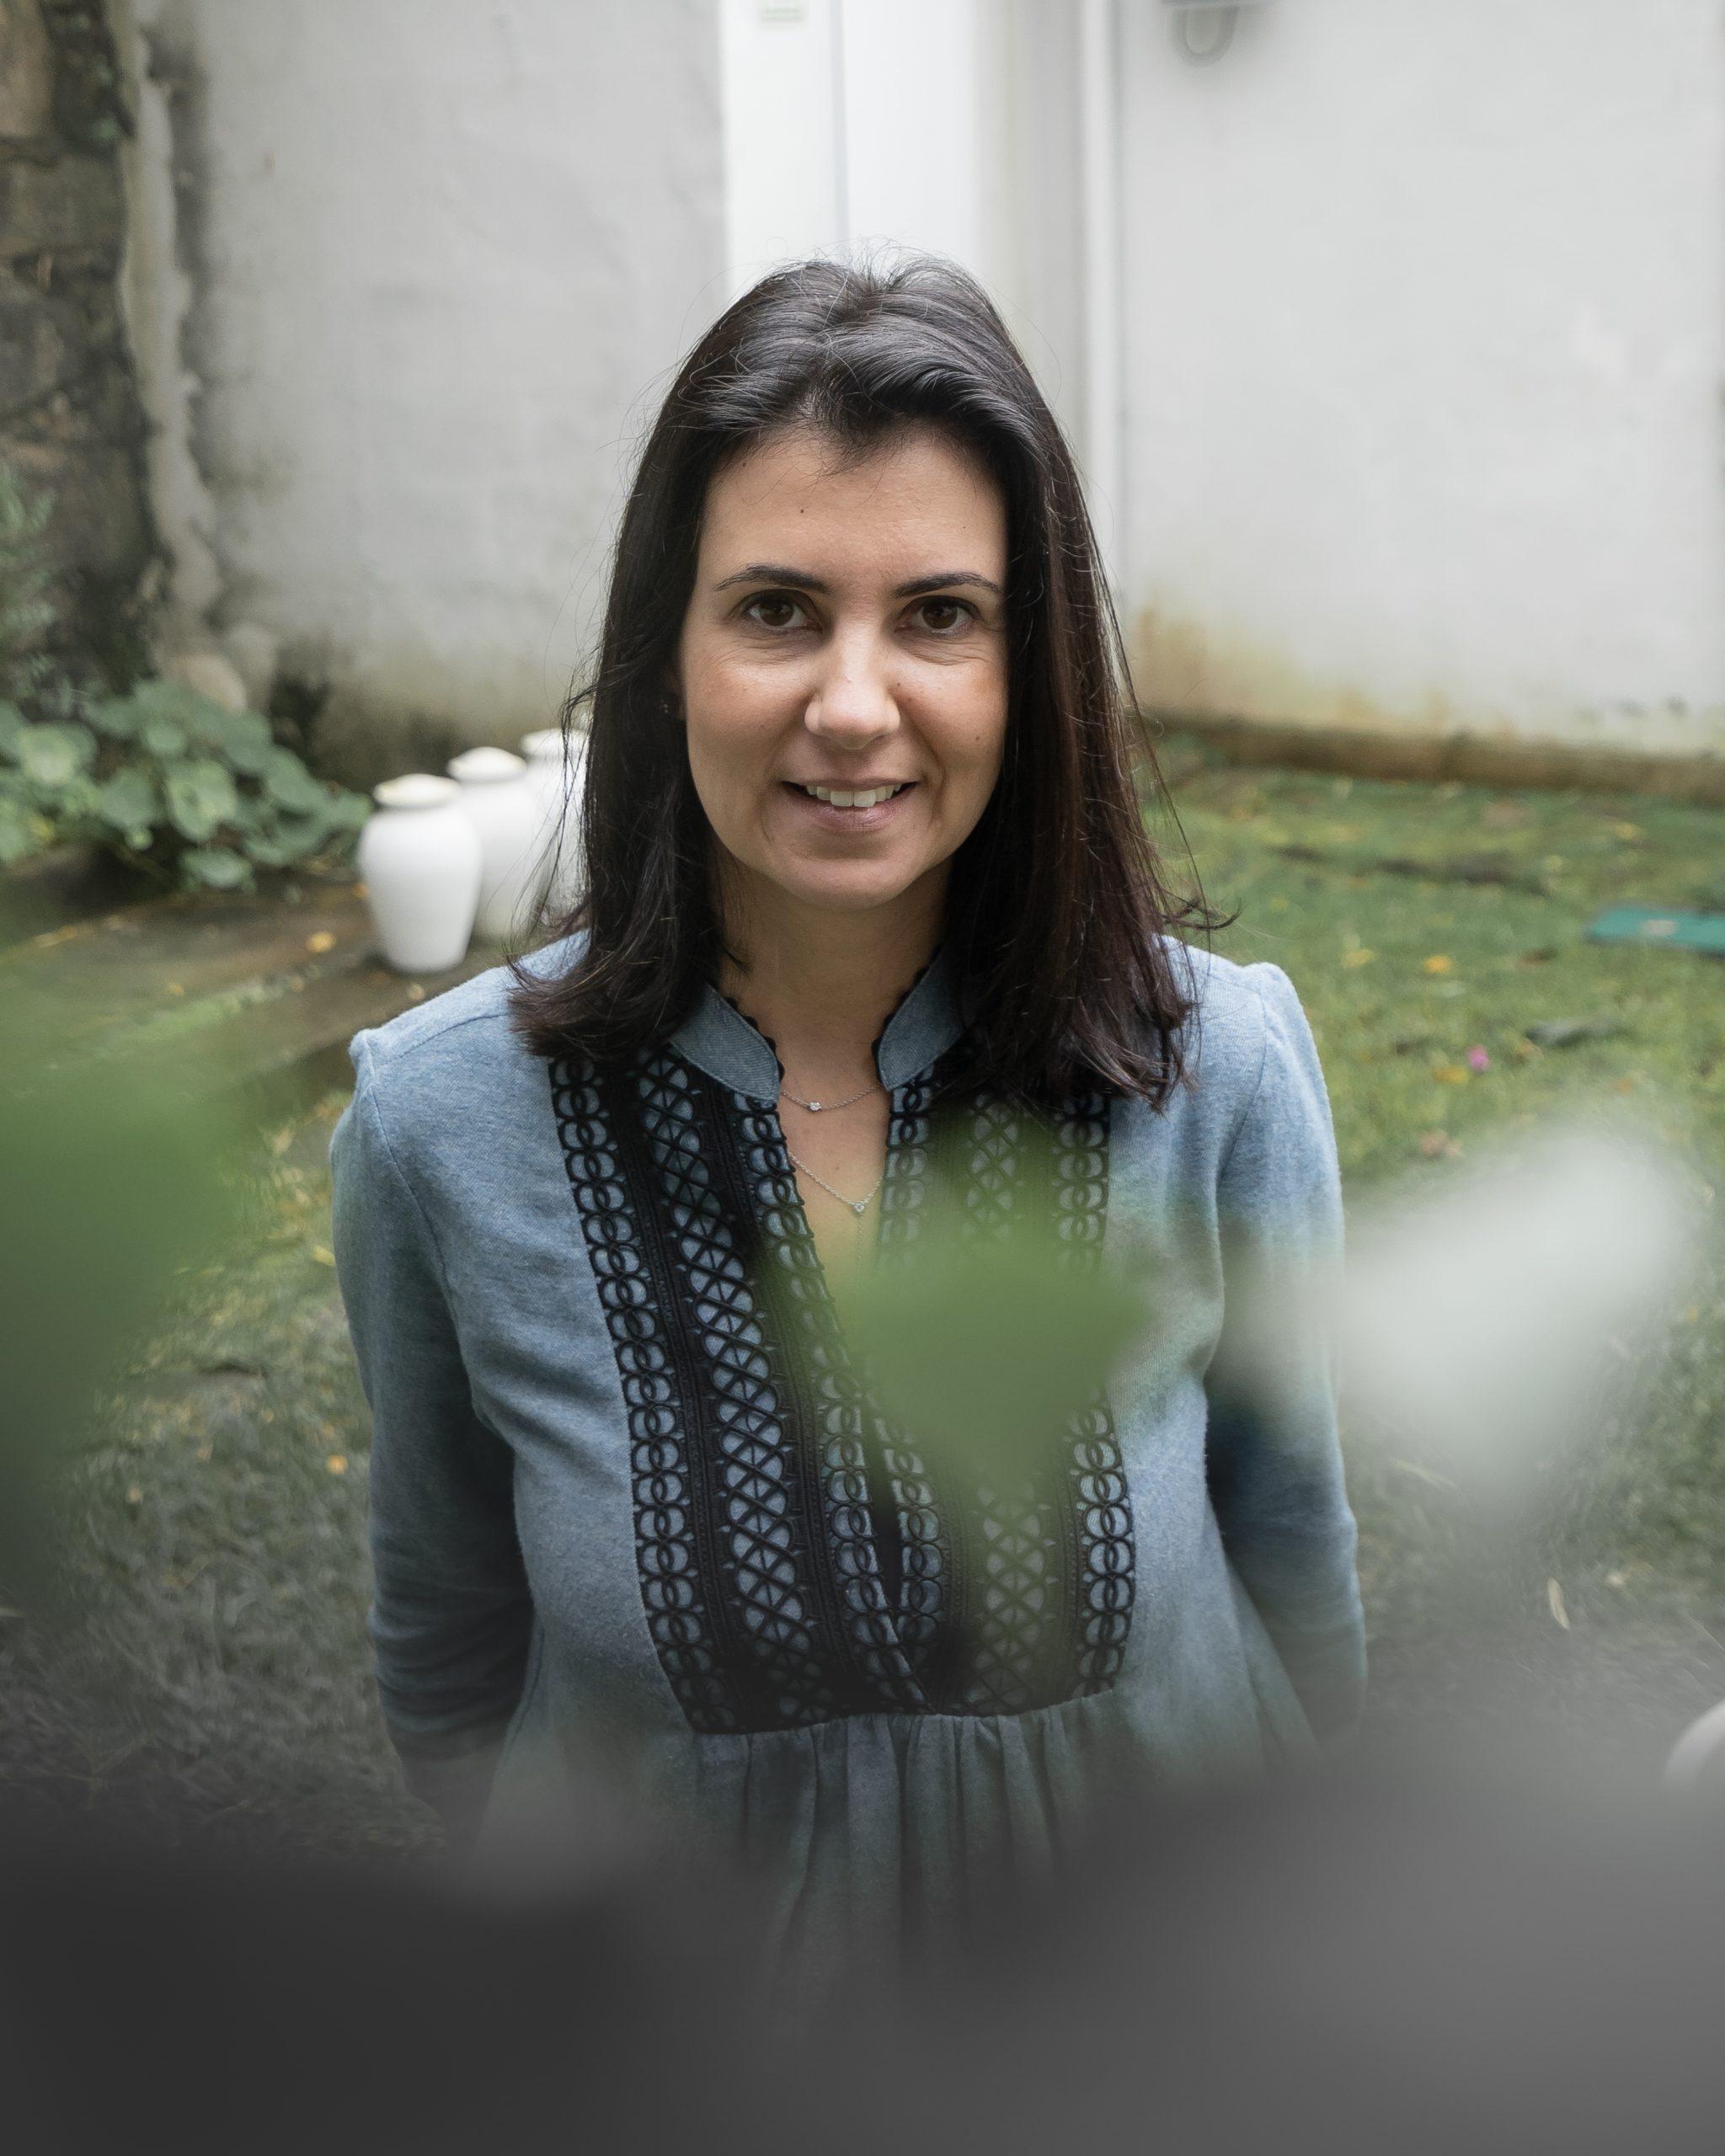 Luísa Caiano